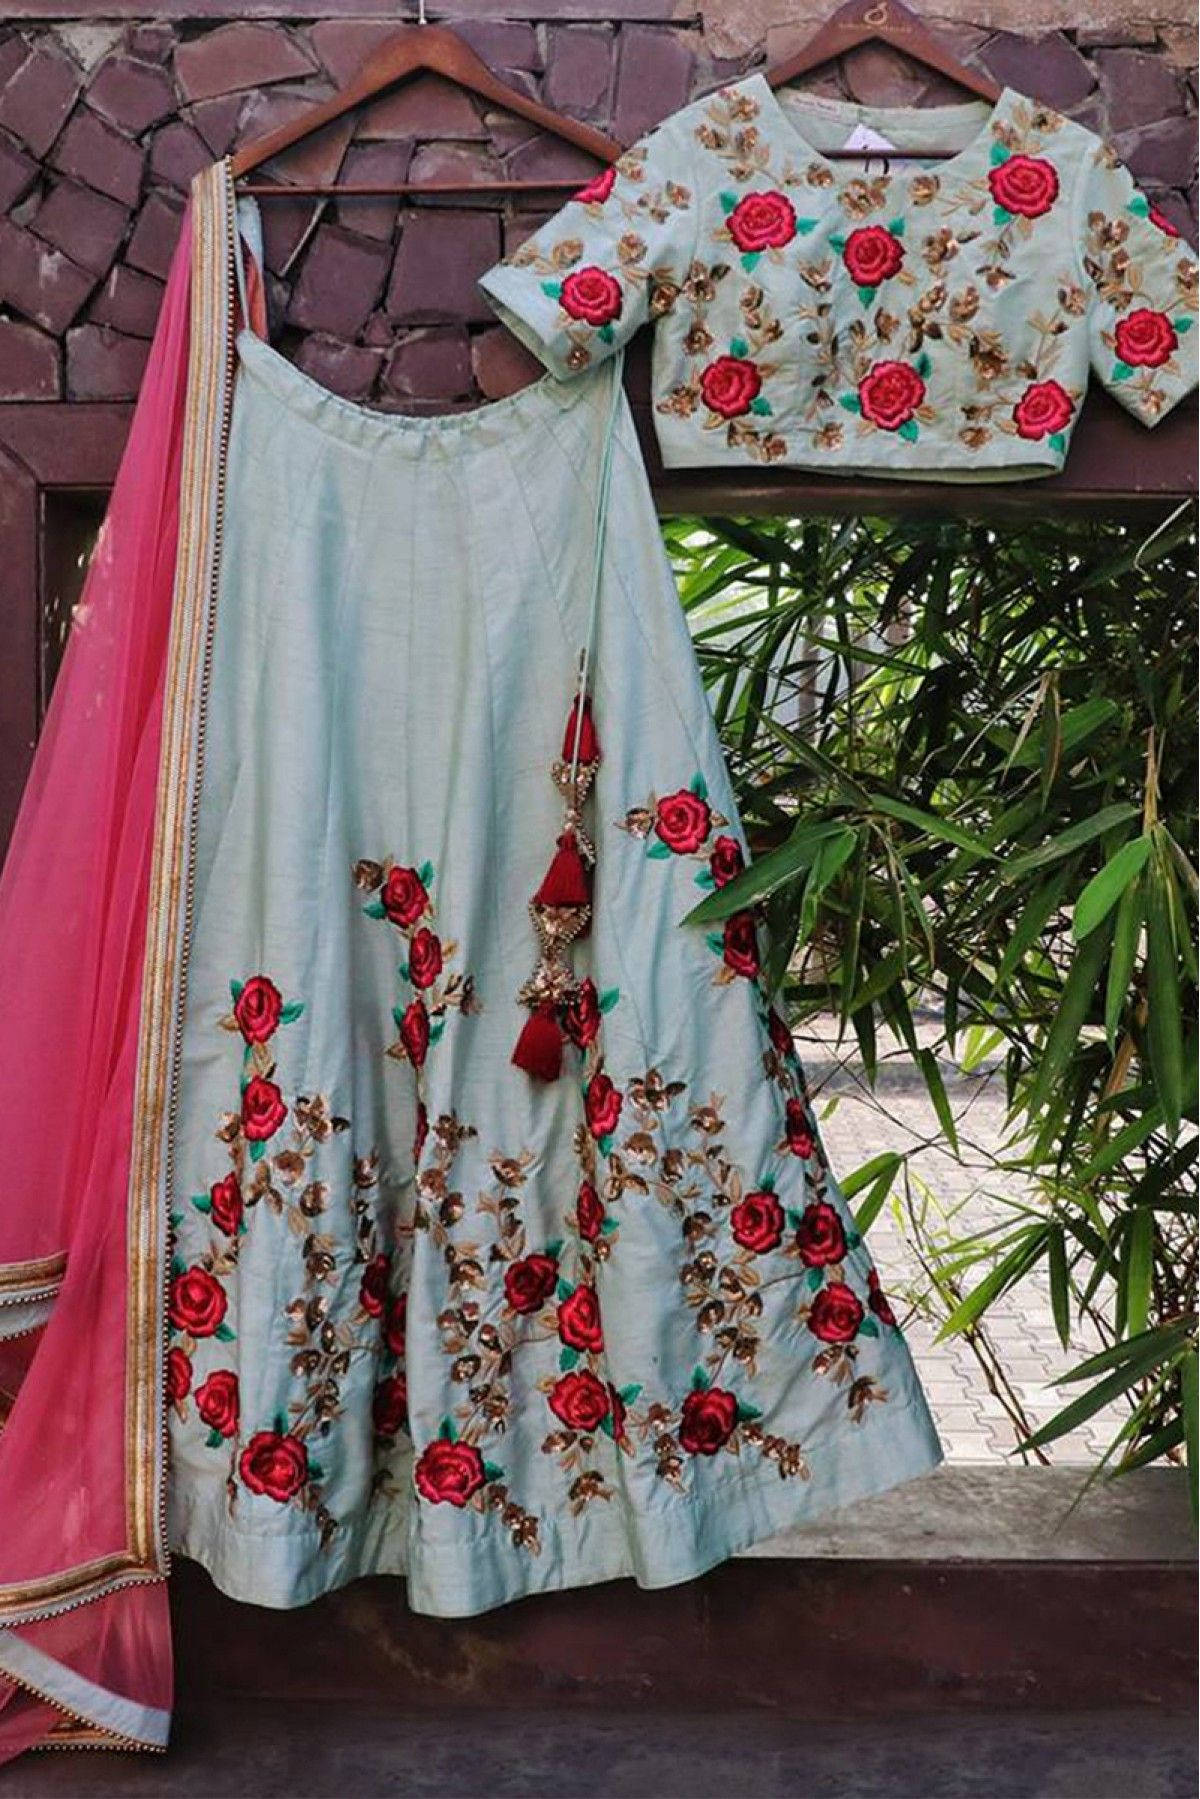 3fa142235 Off White Colour Nylon Nora Silk Fabric Lehenga Choli Comes with matching  blouse. This Lehenga Choli Is crafted with Embroidery This Lehenga Choli  Comes ...